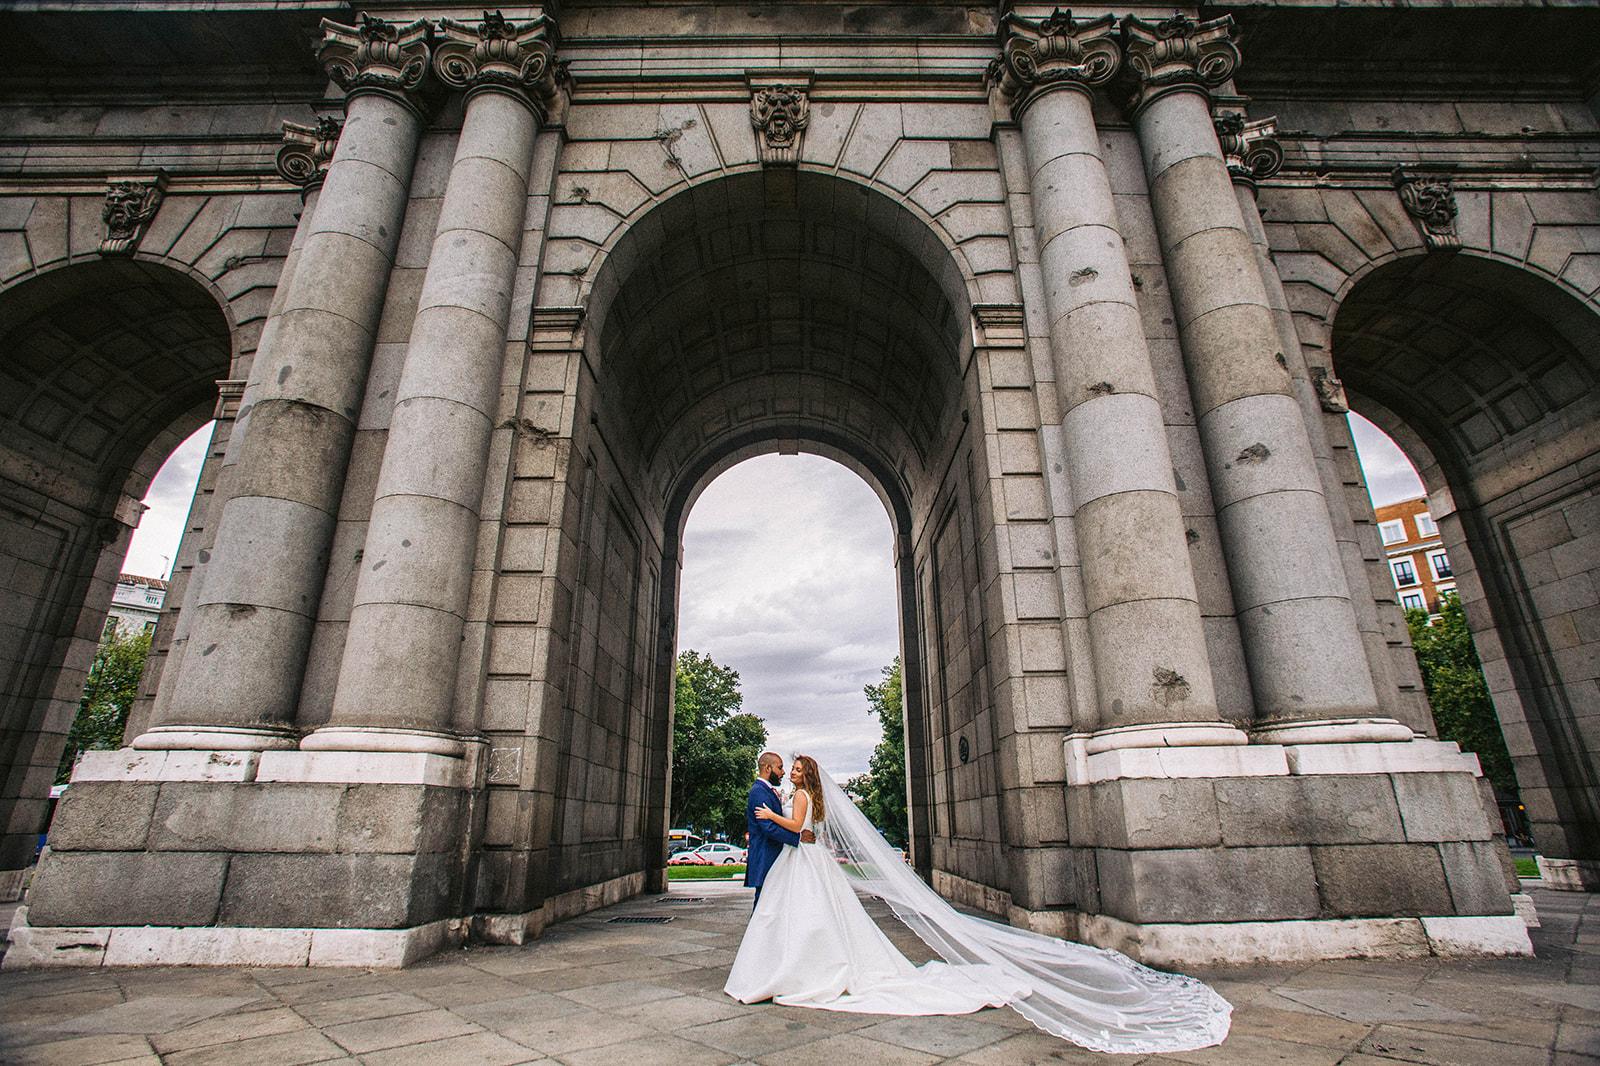 sesión post boda en Puerta de Alcalá